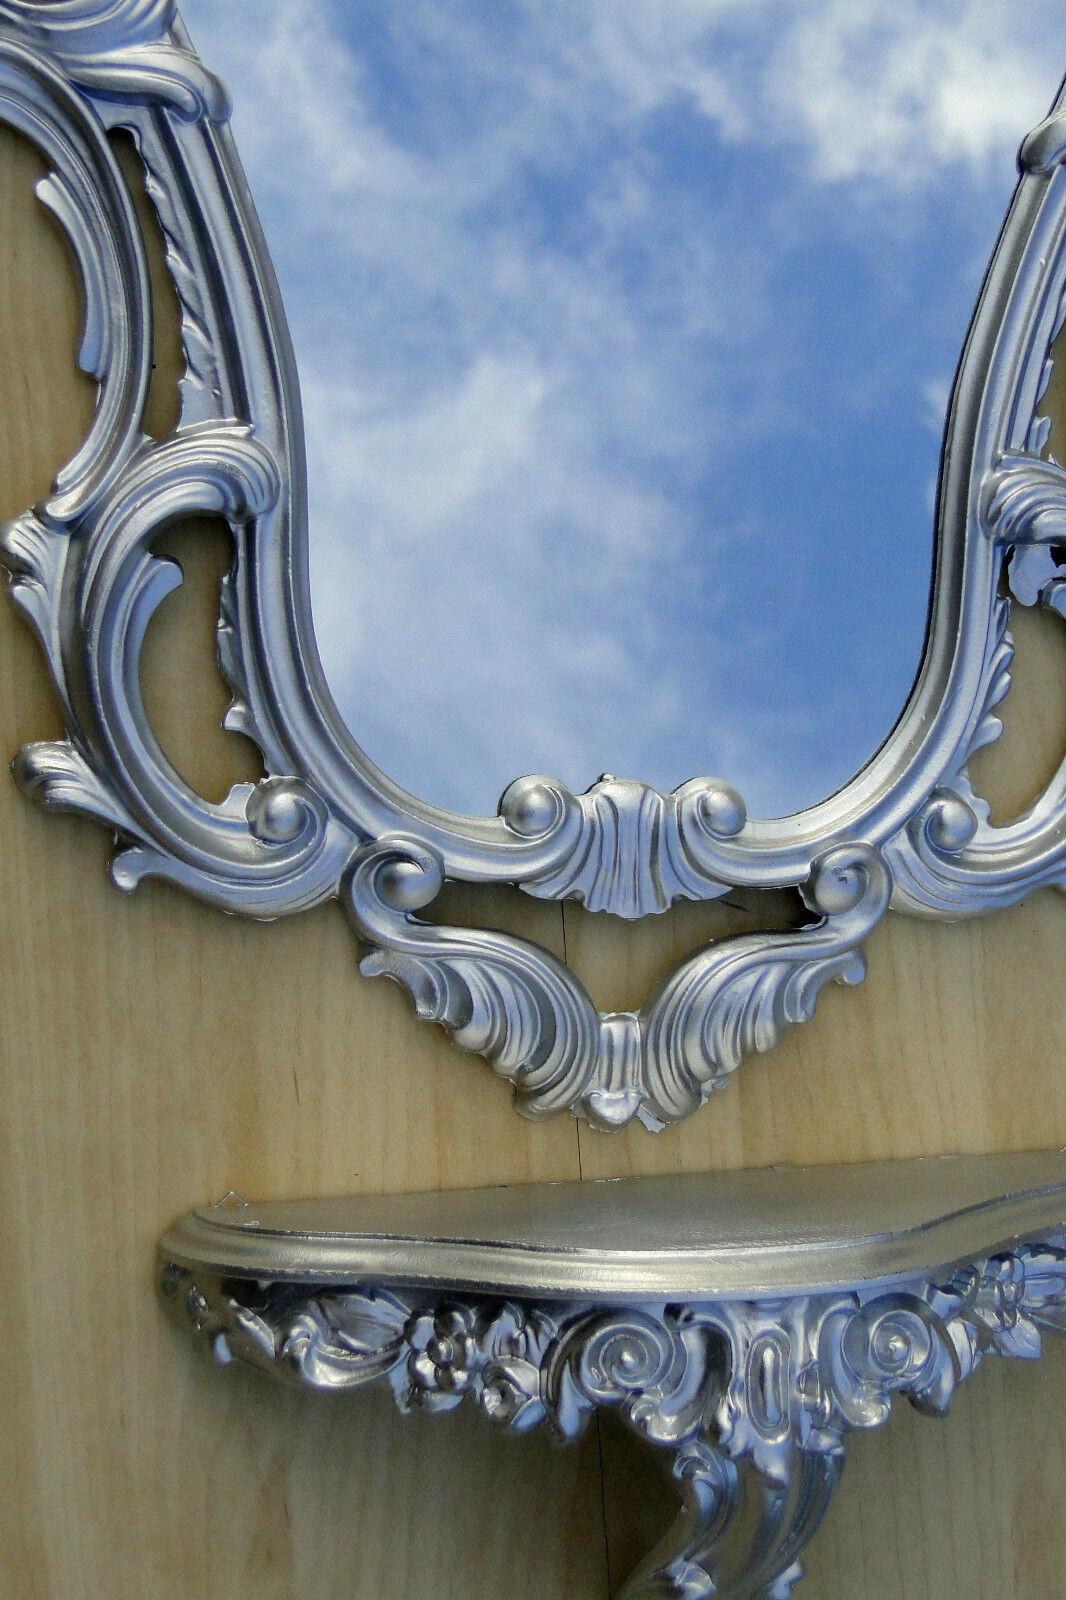 Wandspiegel Antik Silber mit Wandkonsole Antik 76x50 Wandregal Badspiegel Repro